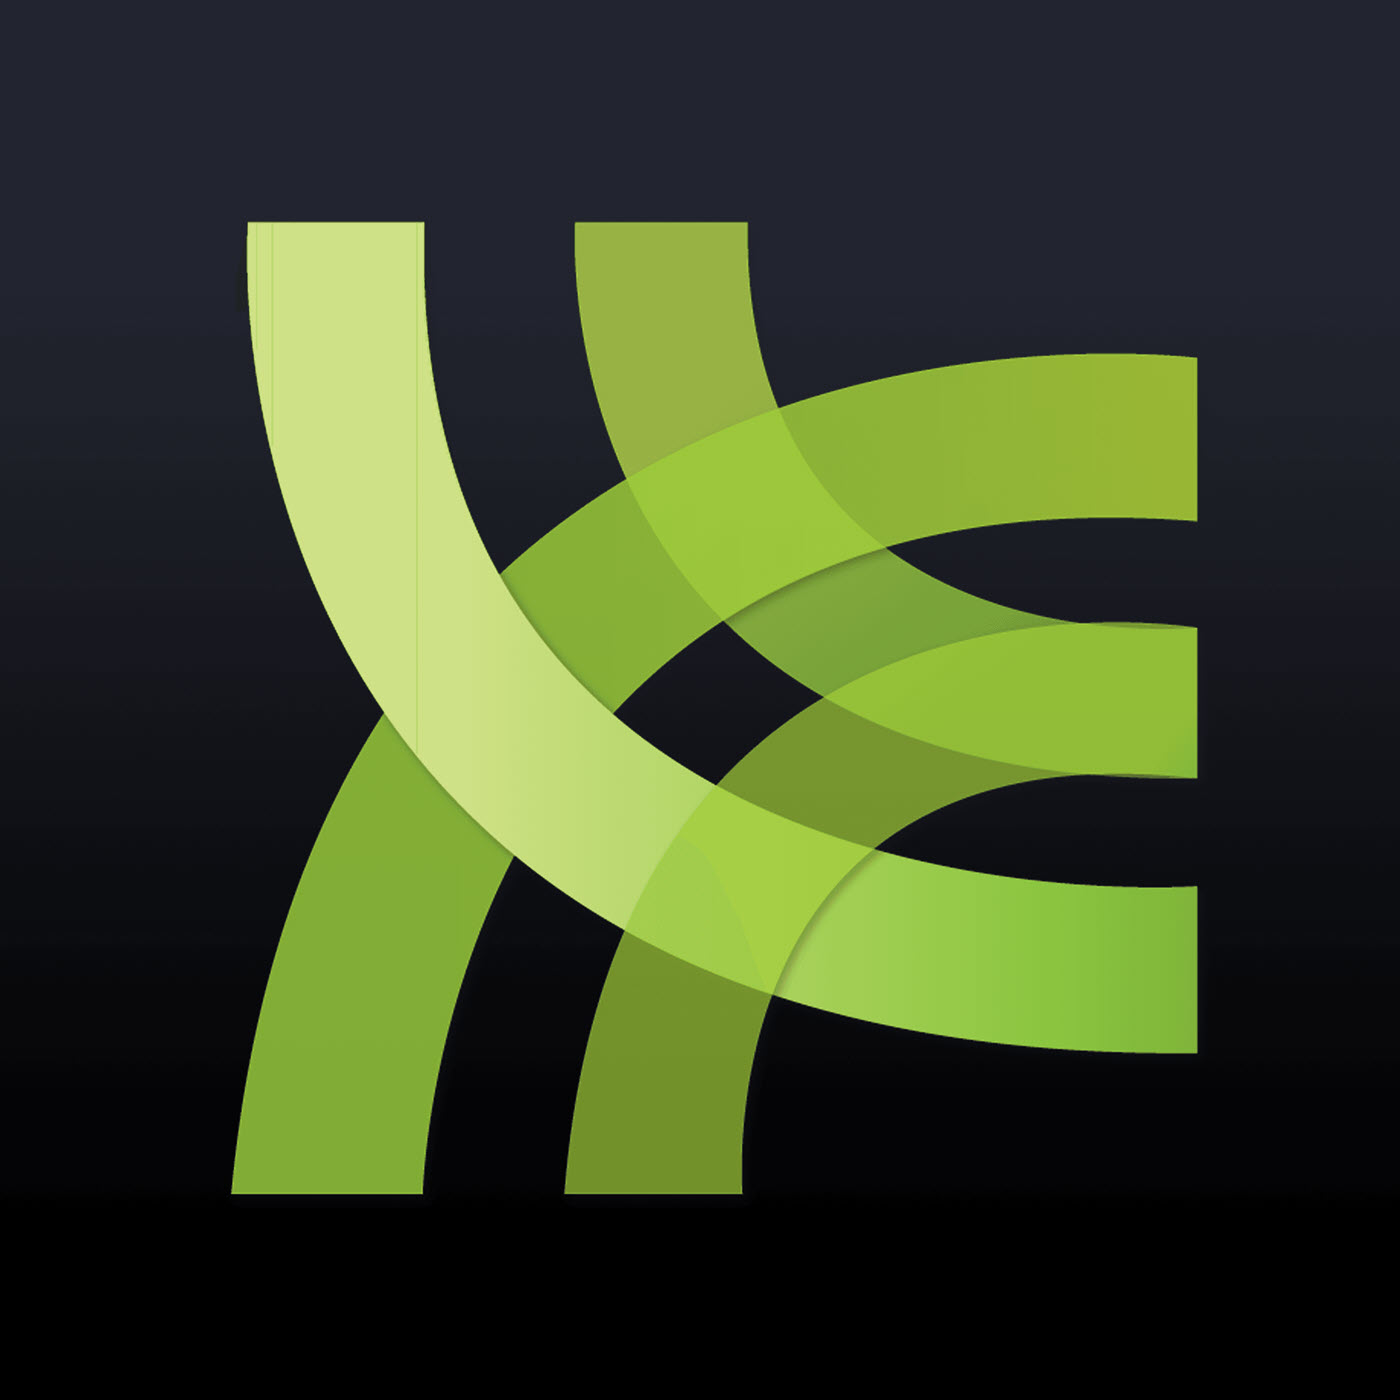 eck-symbol-200-dpi.jpg